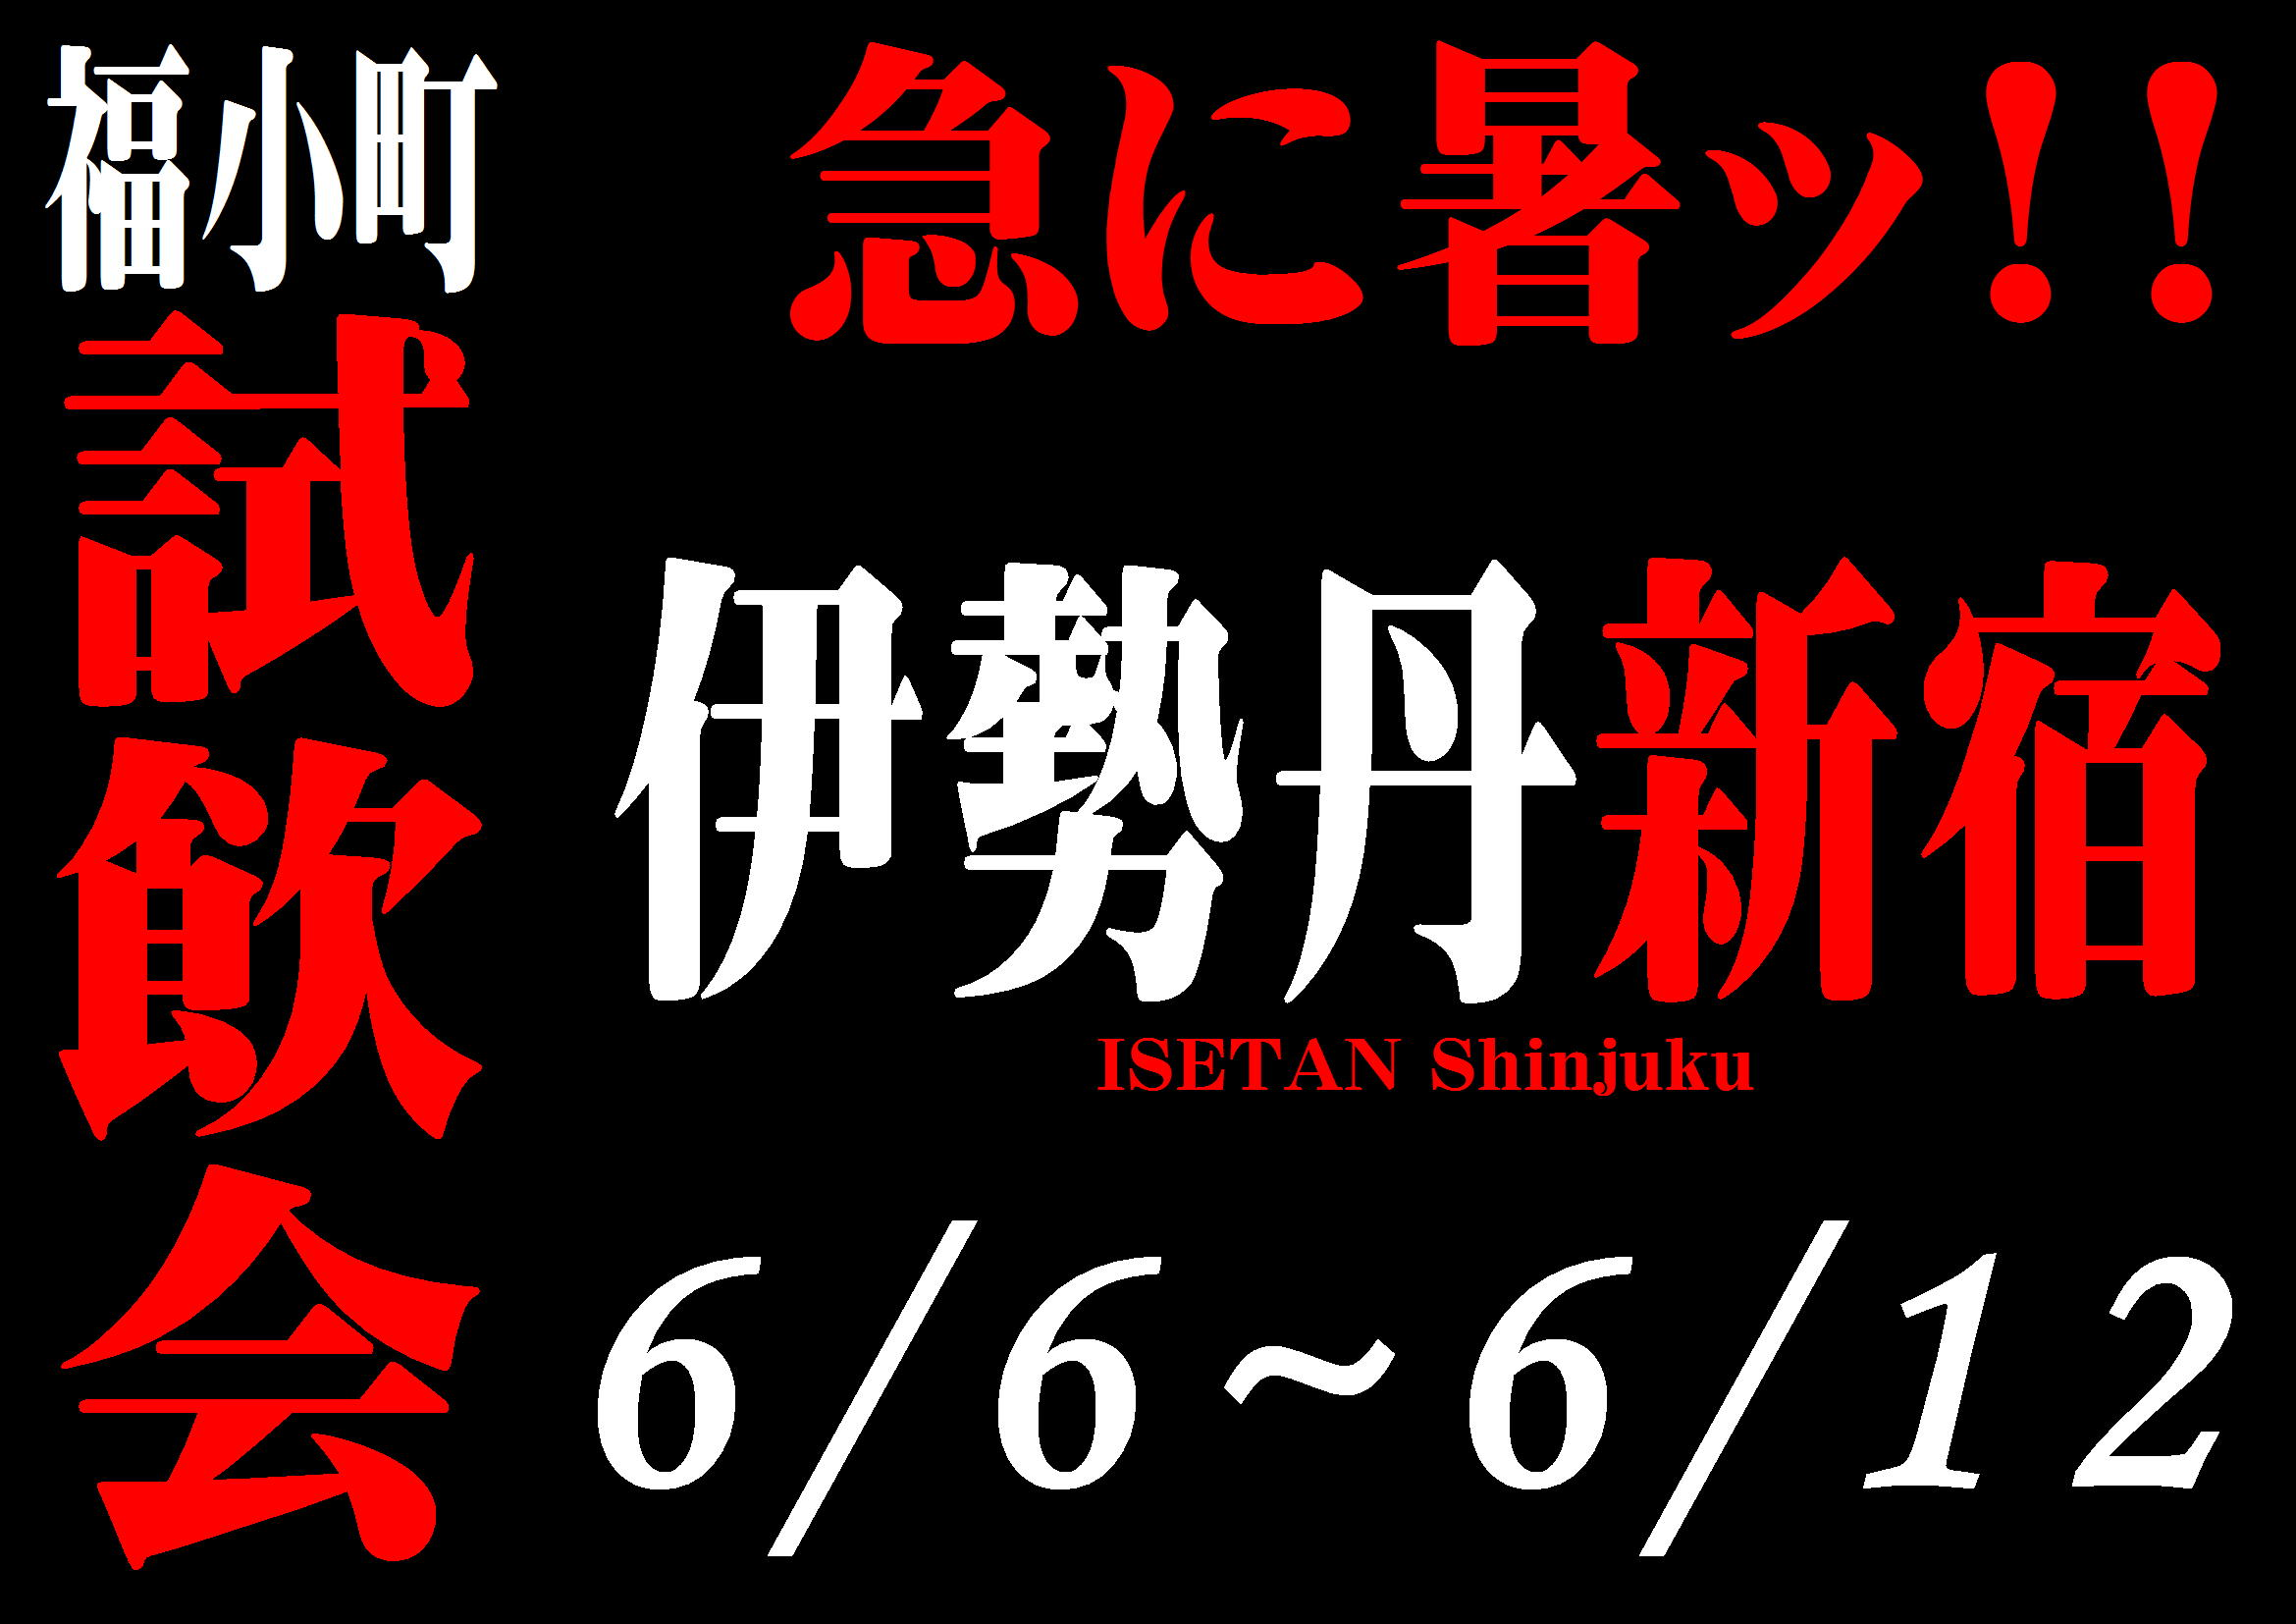 http://www.fukukomachi.com/blog/photo/20180606-1.JPG